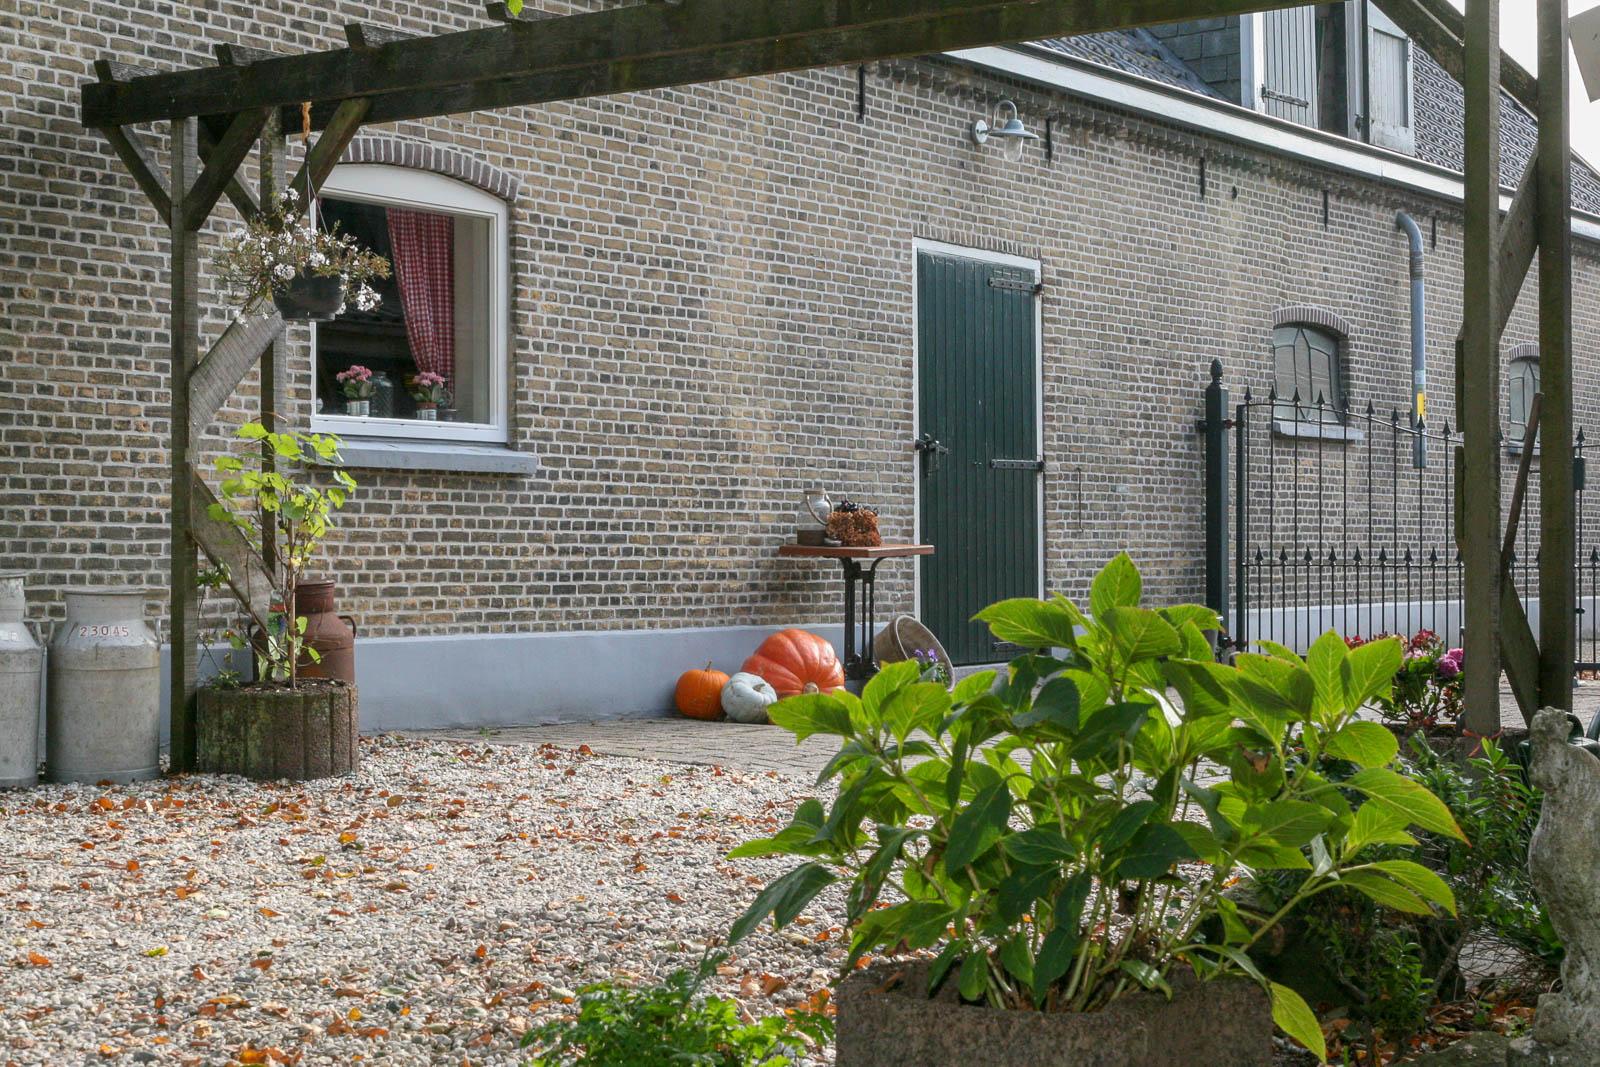 Hillegondahoeve-De Oude Stal-1483